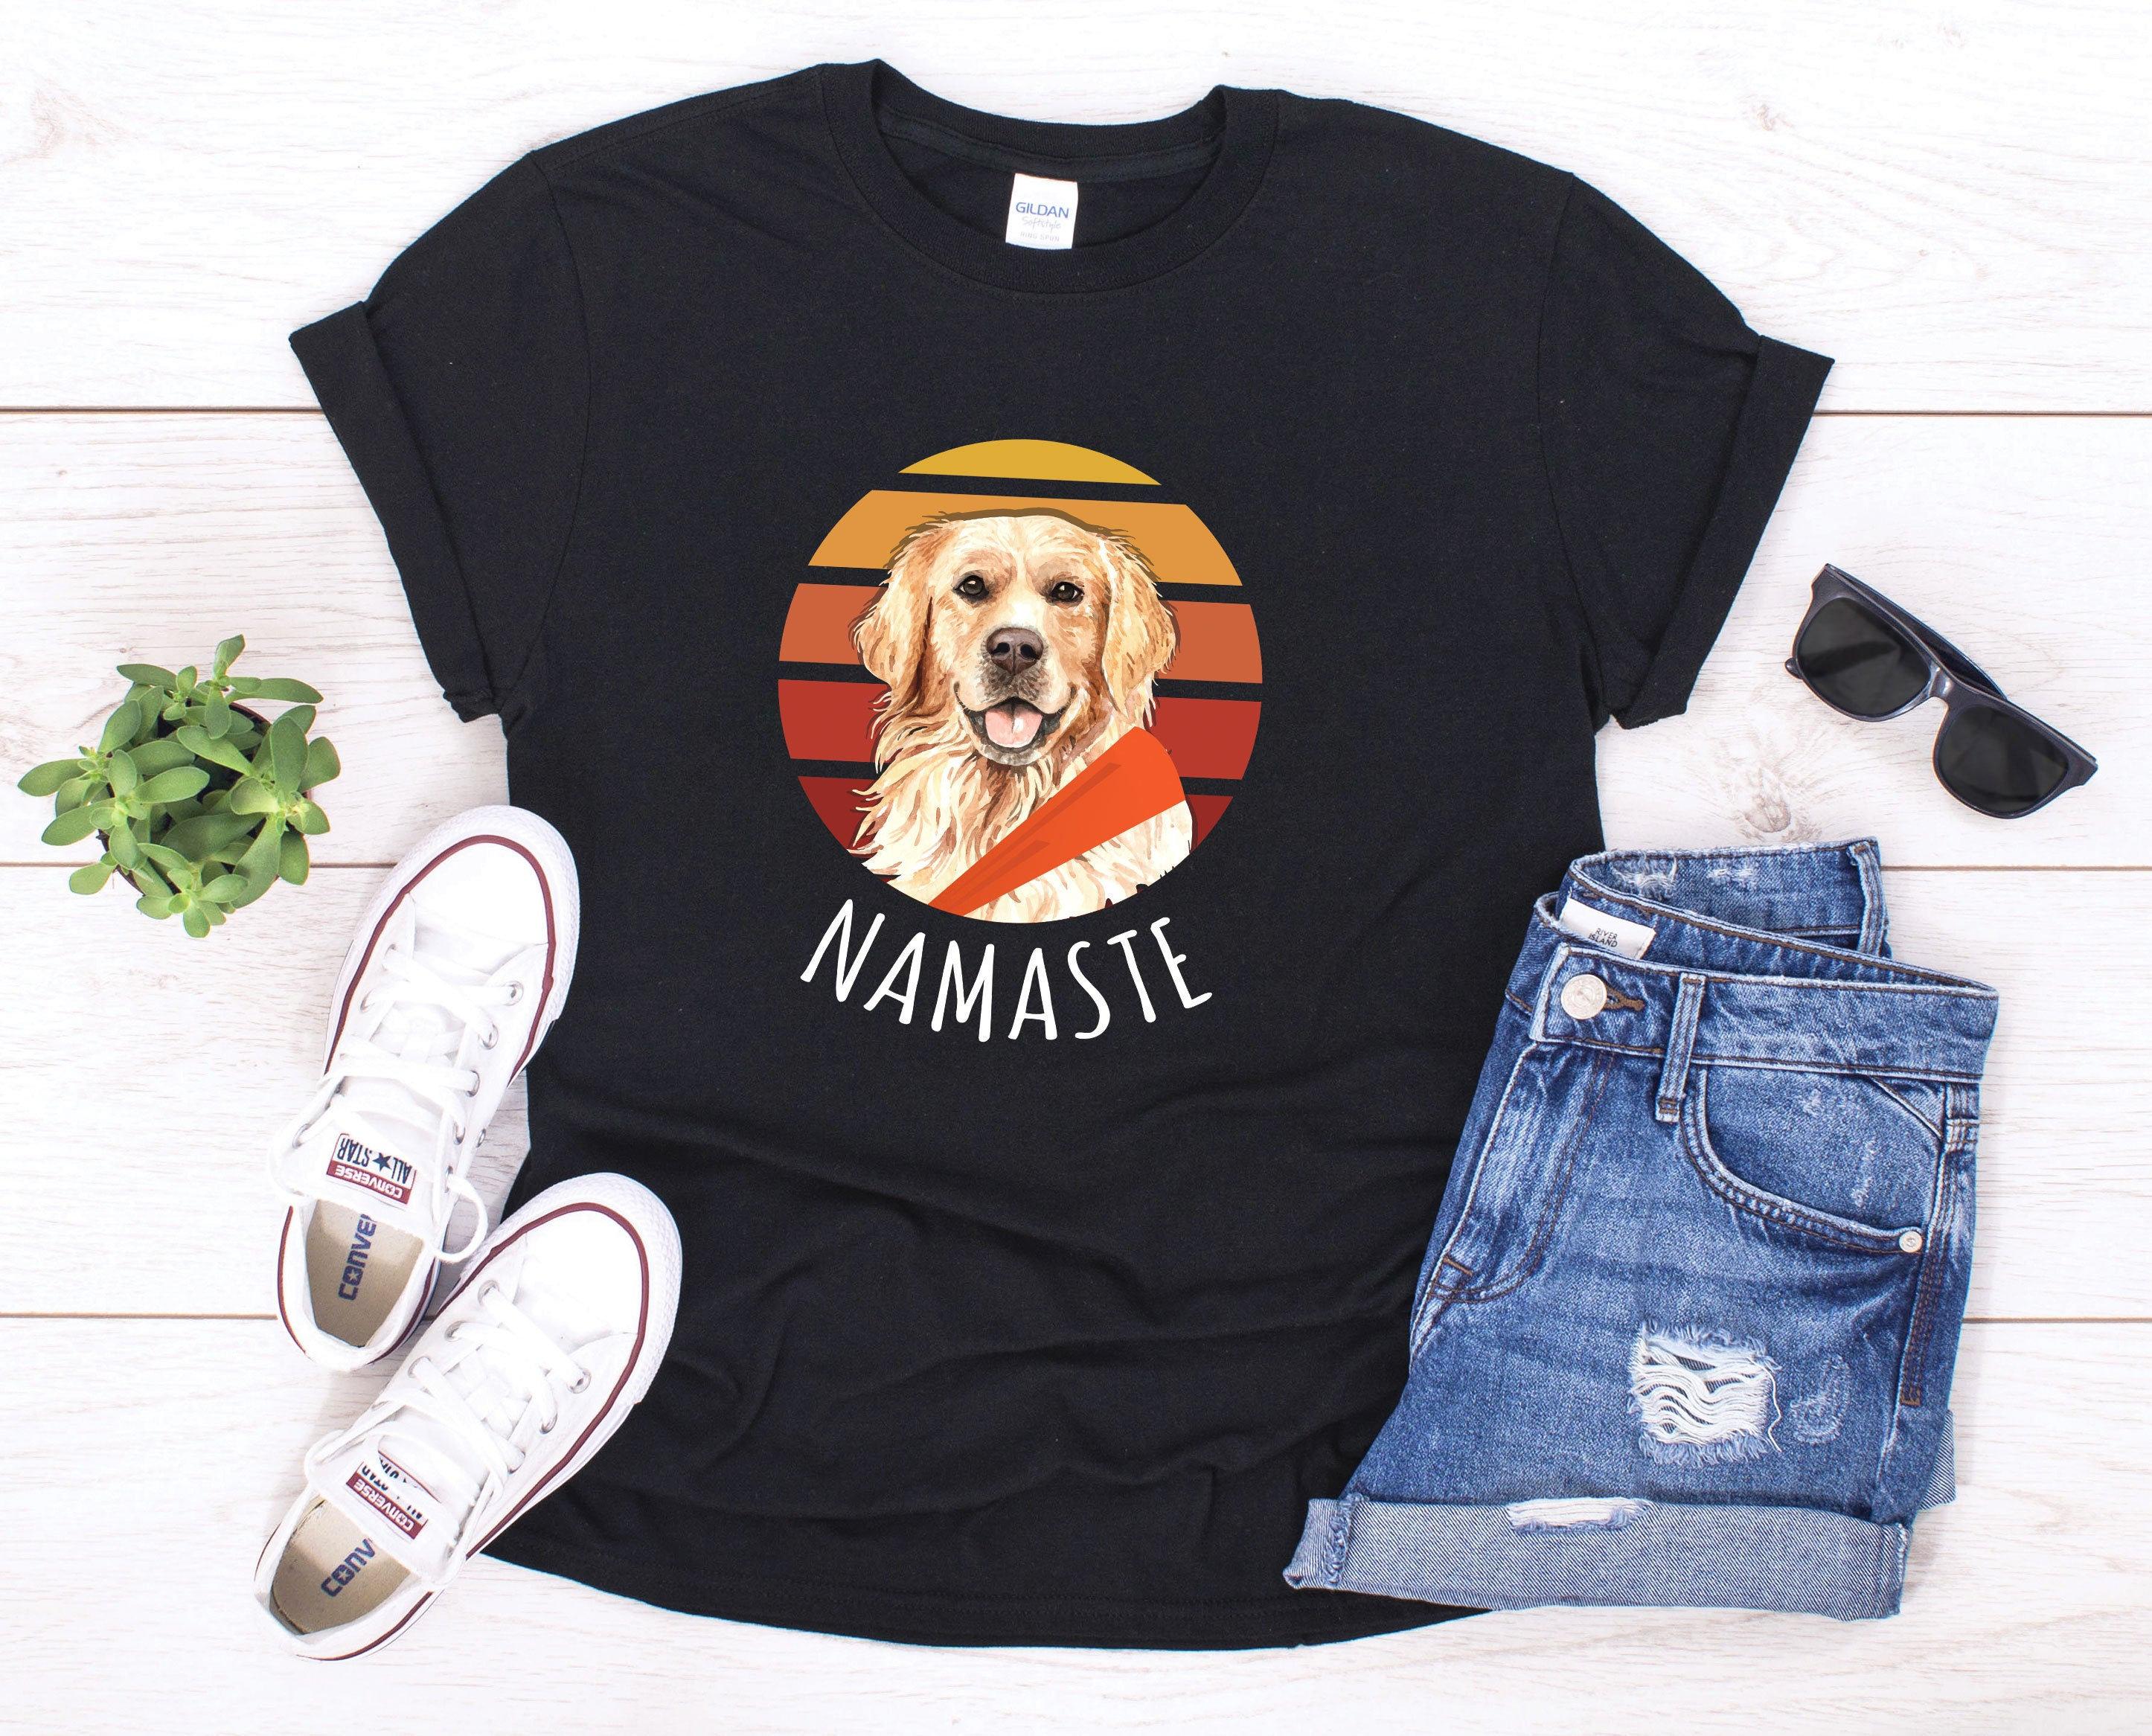 4th of July Patriotic Dog Golden Retriever Navy Adult T-Shirt